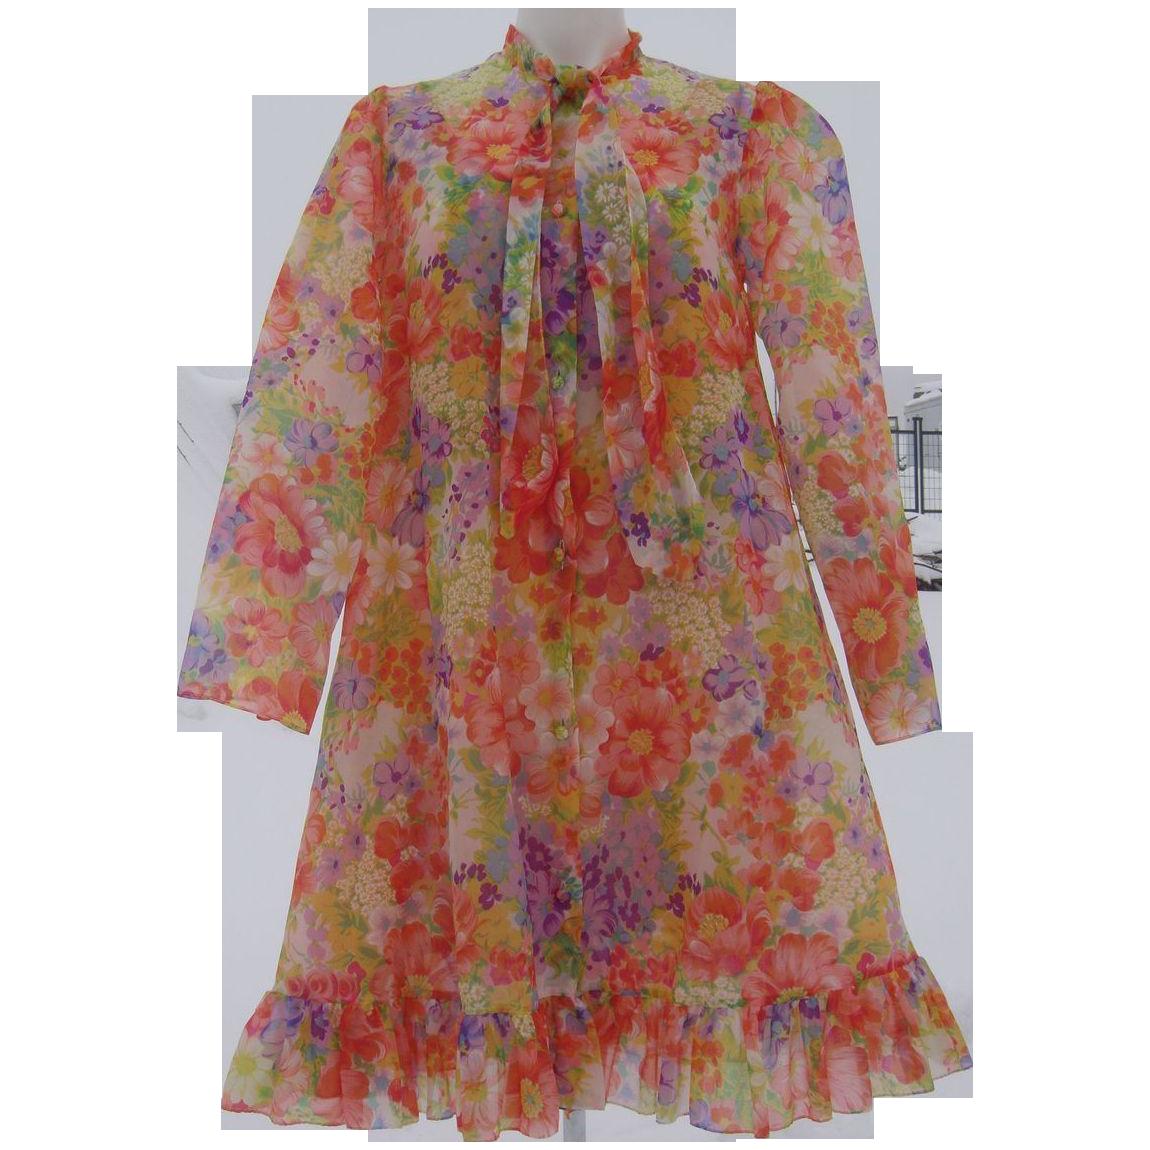 Vintage Linda Lingerie Nightgown Peignoir Robe Set 1970's